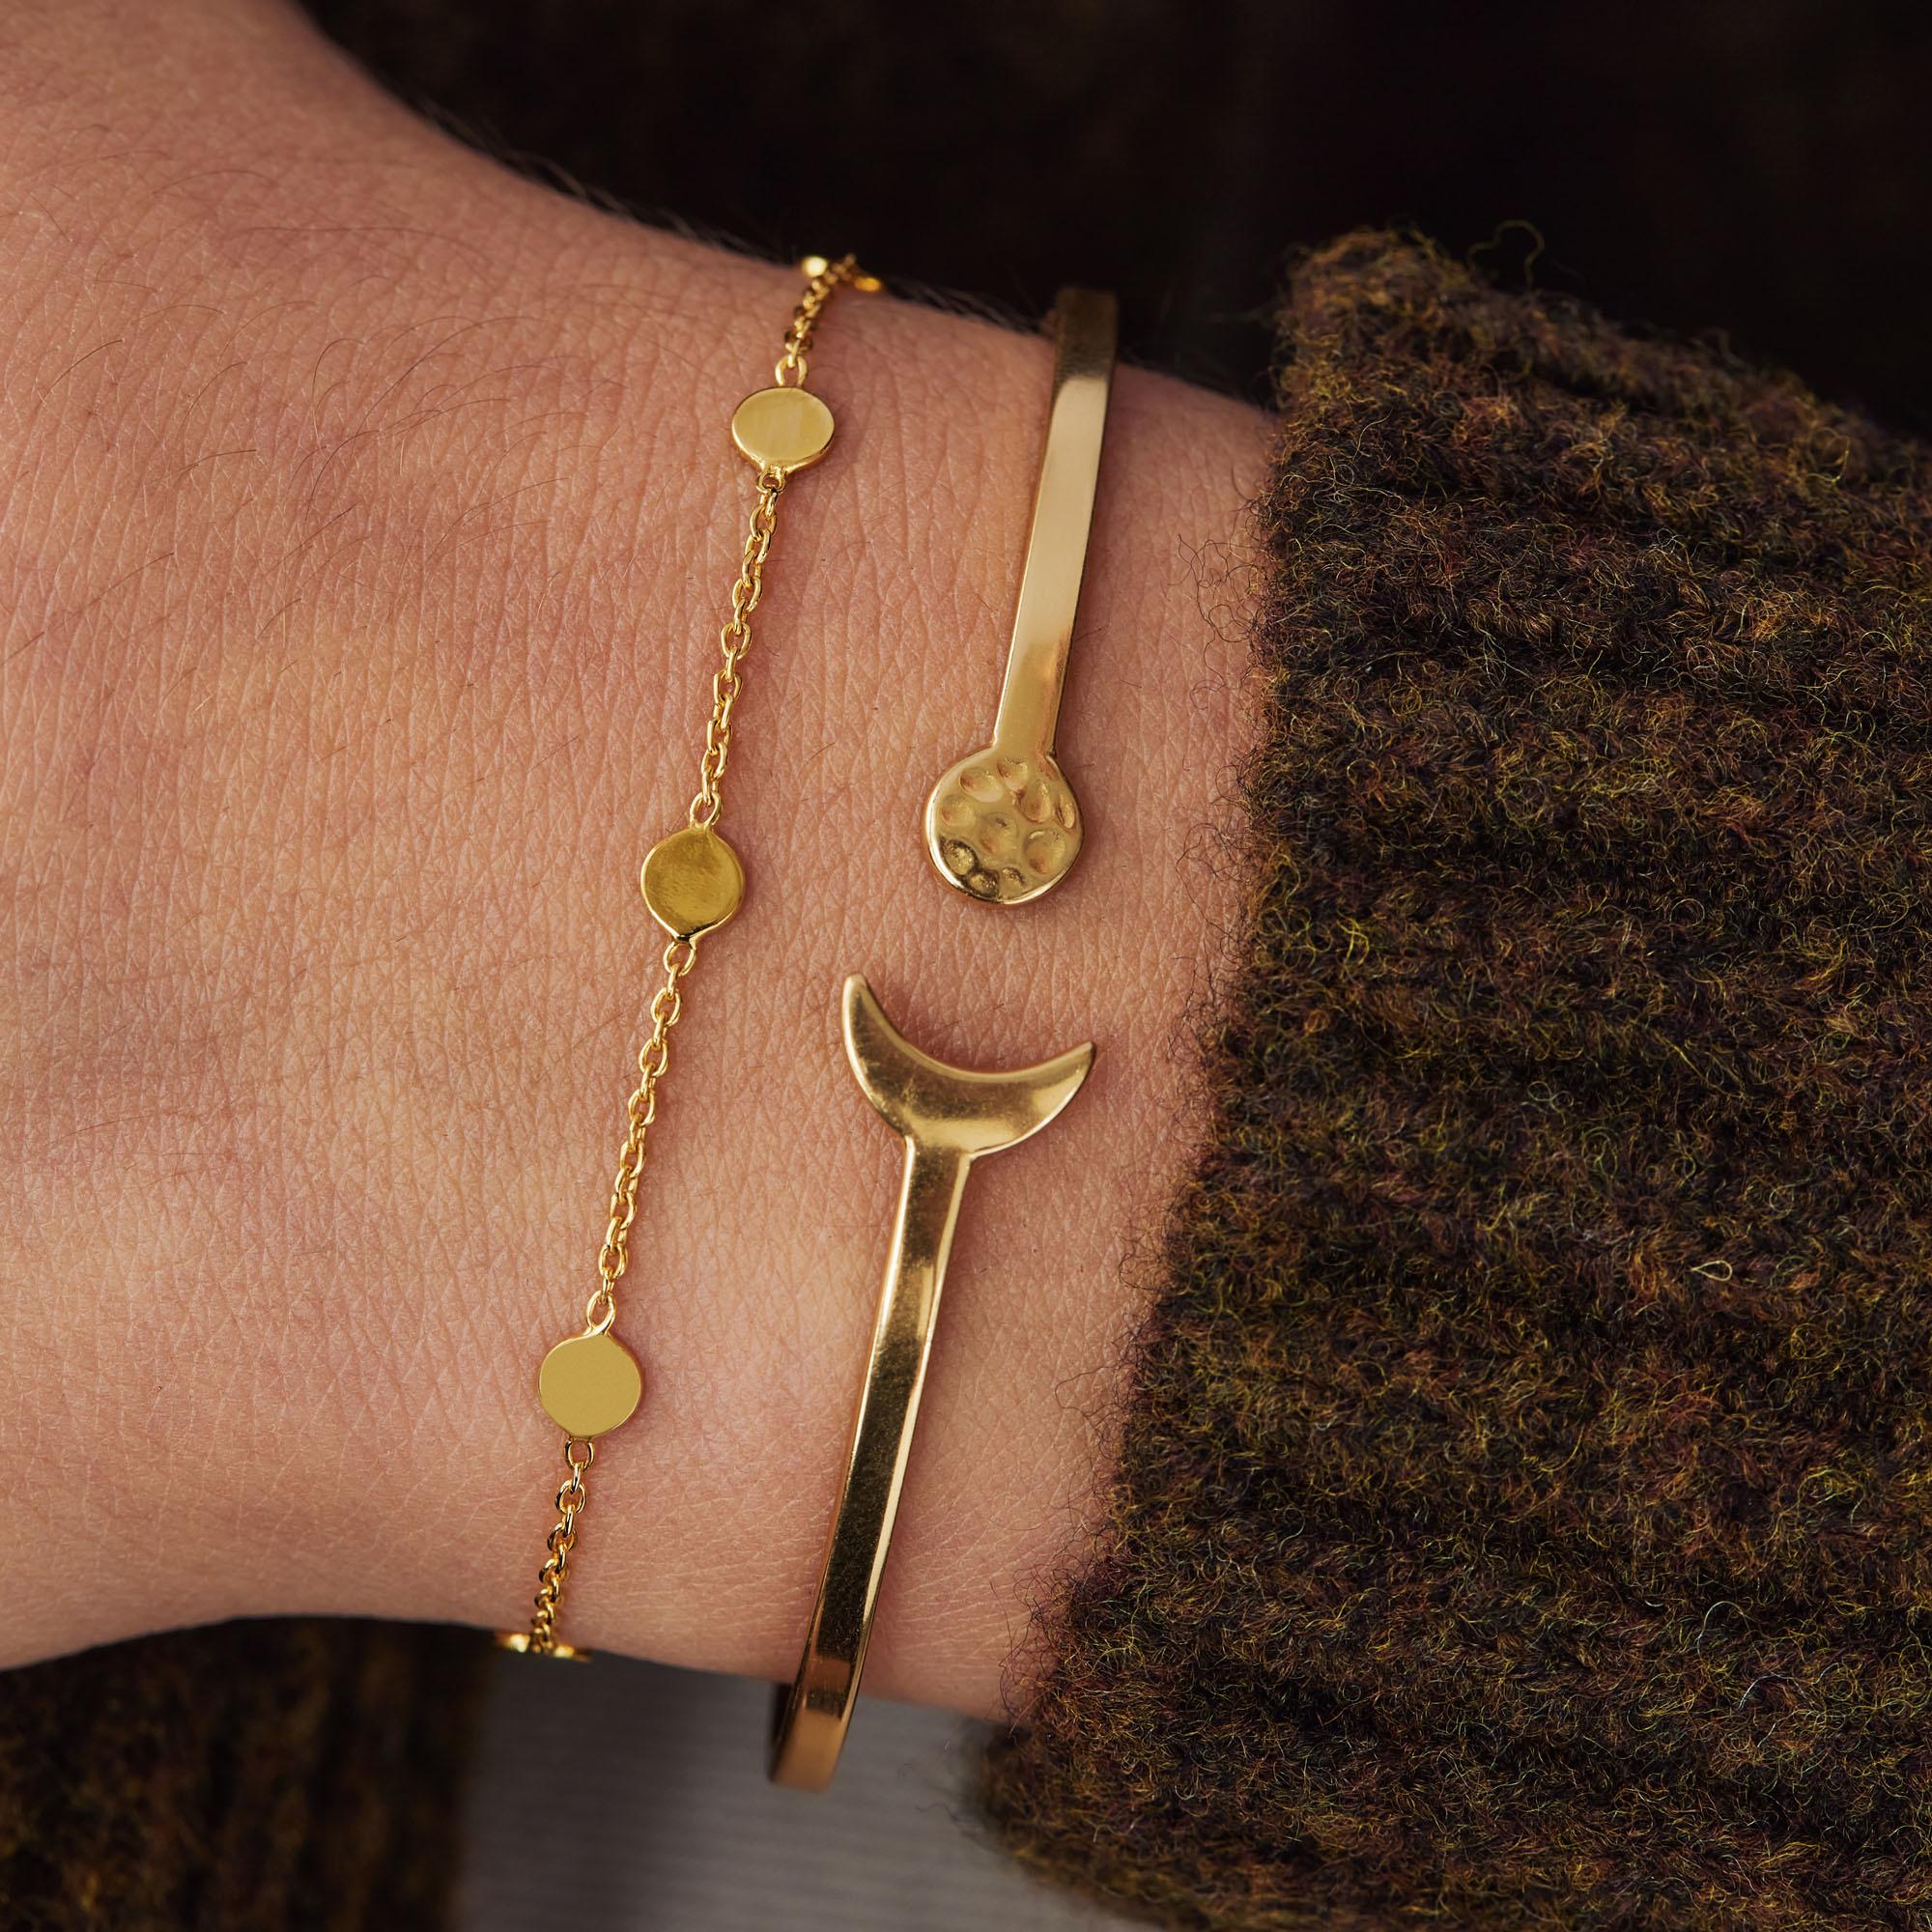 Violet Hamden Luna bracciale color oro in argento sterling 925